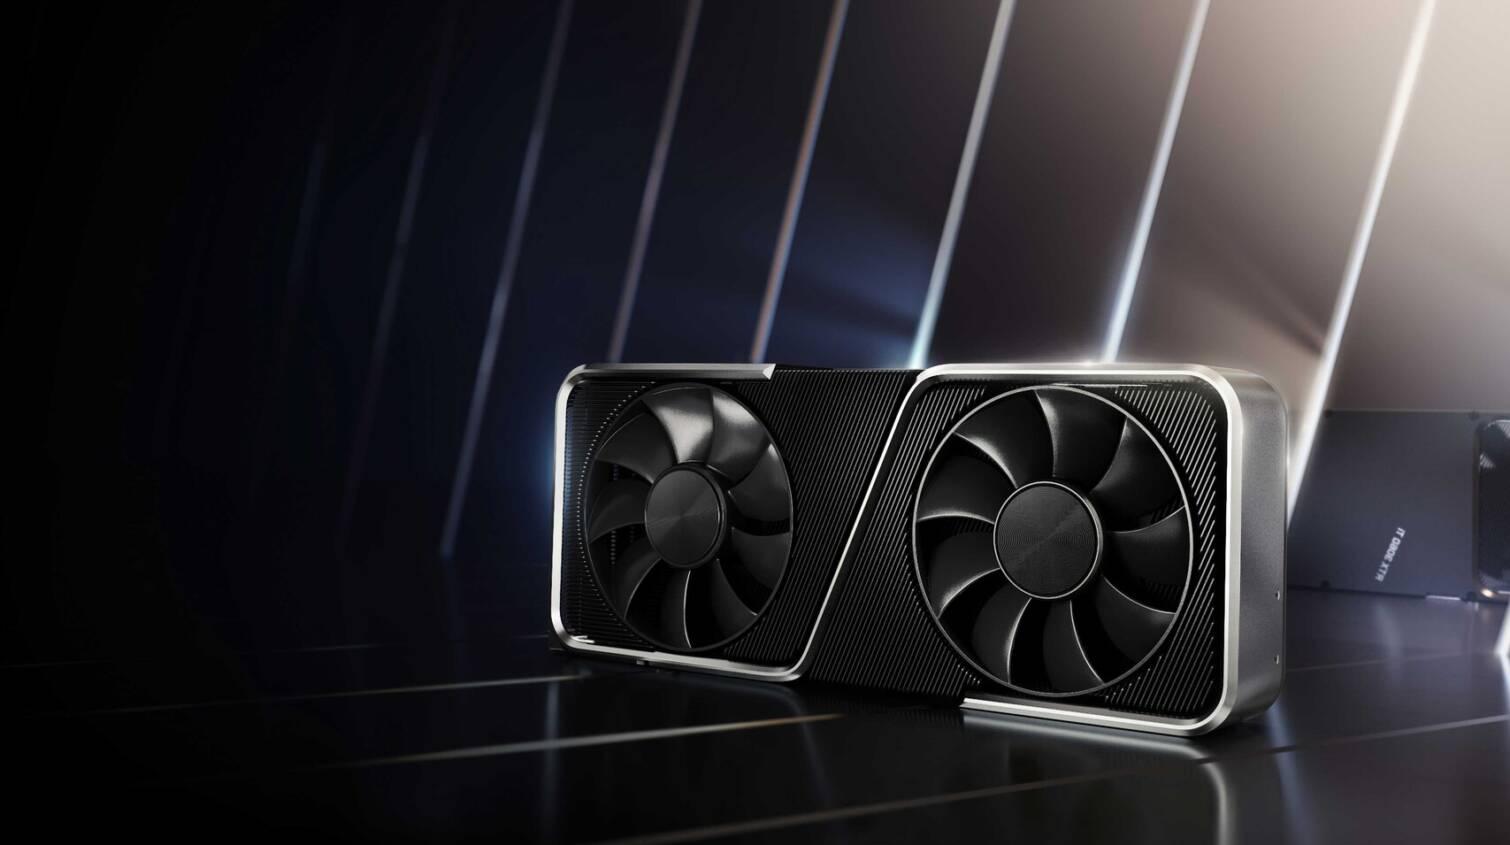 NVIDIA Releases GeForce 457.51 WHQL Drivers